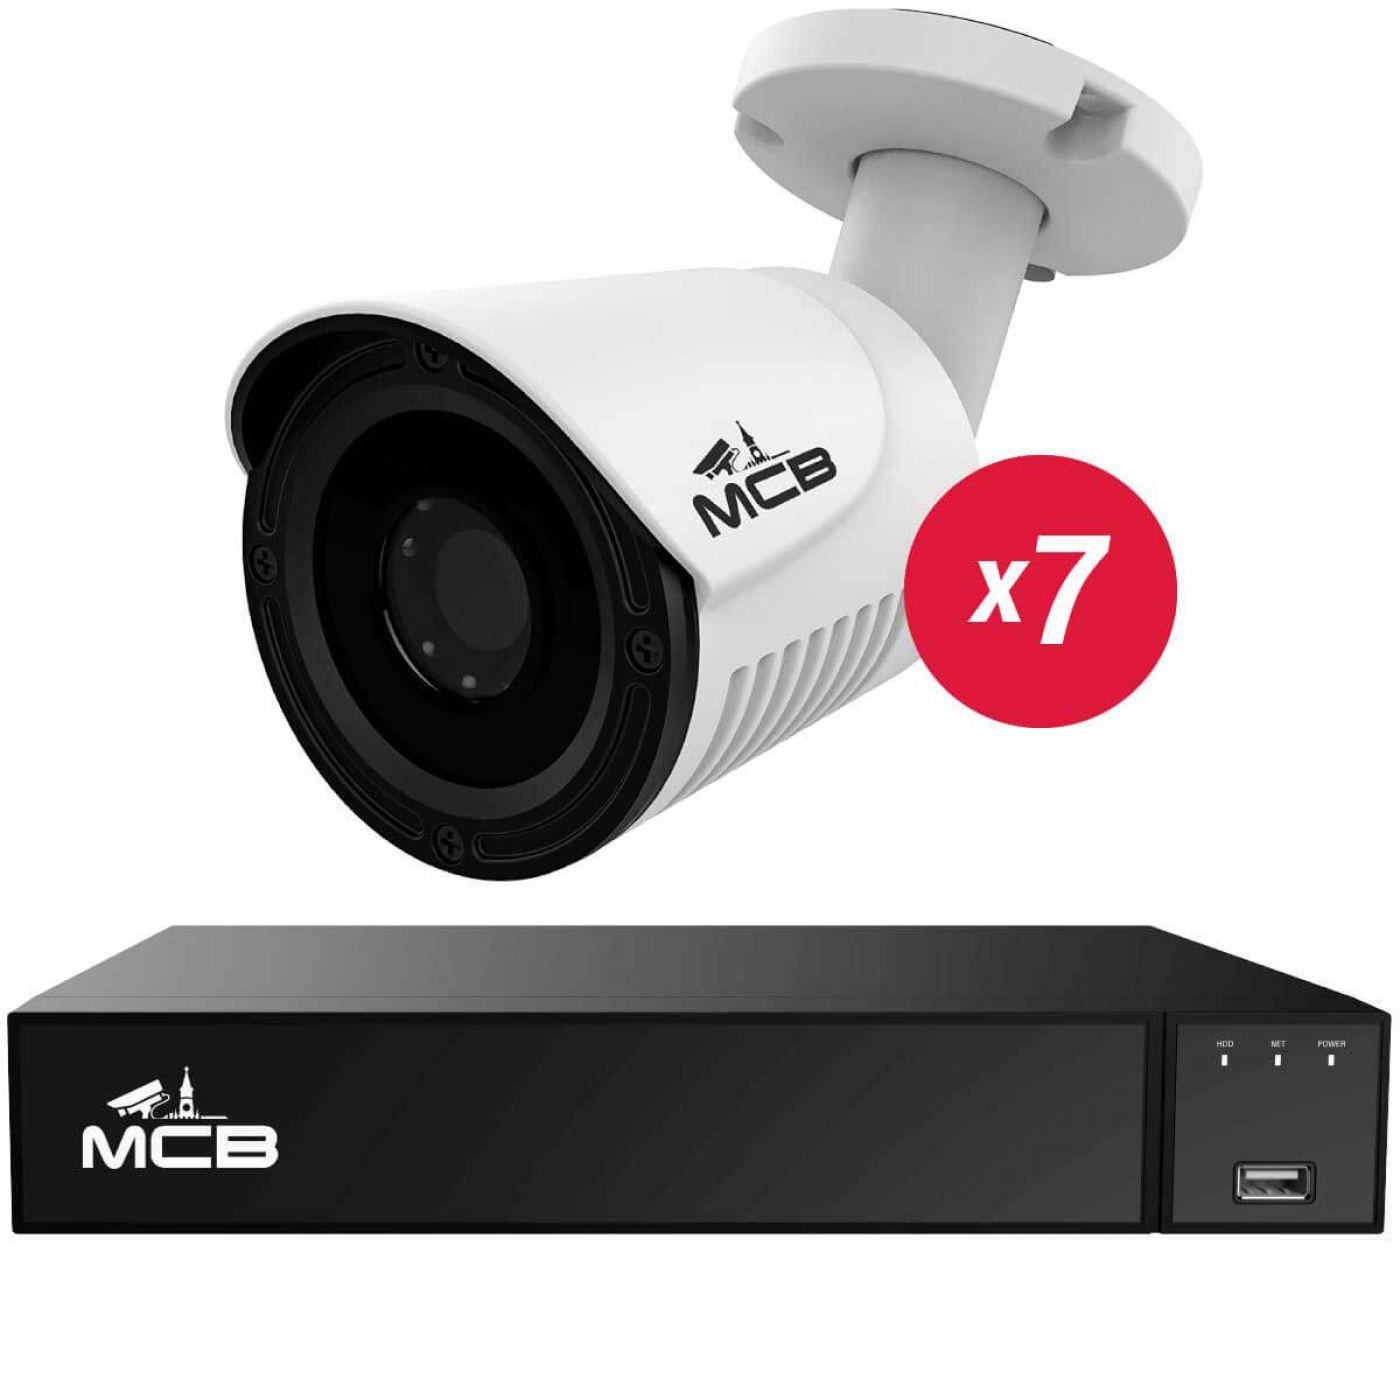 Комплект видеонаблюдения на 7 камер 2 Мегапикселя 1080N